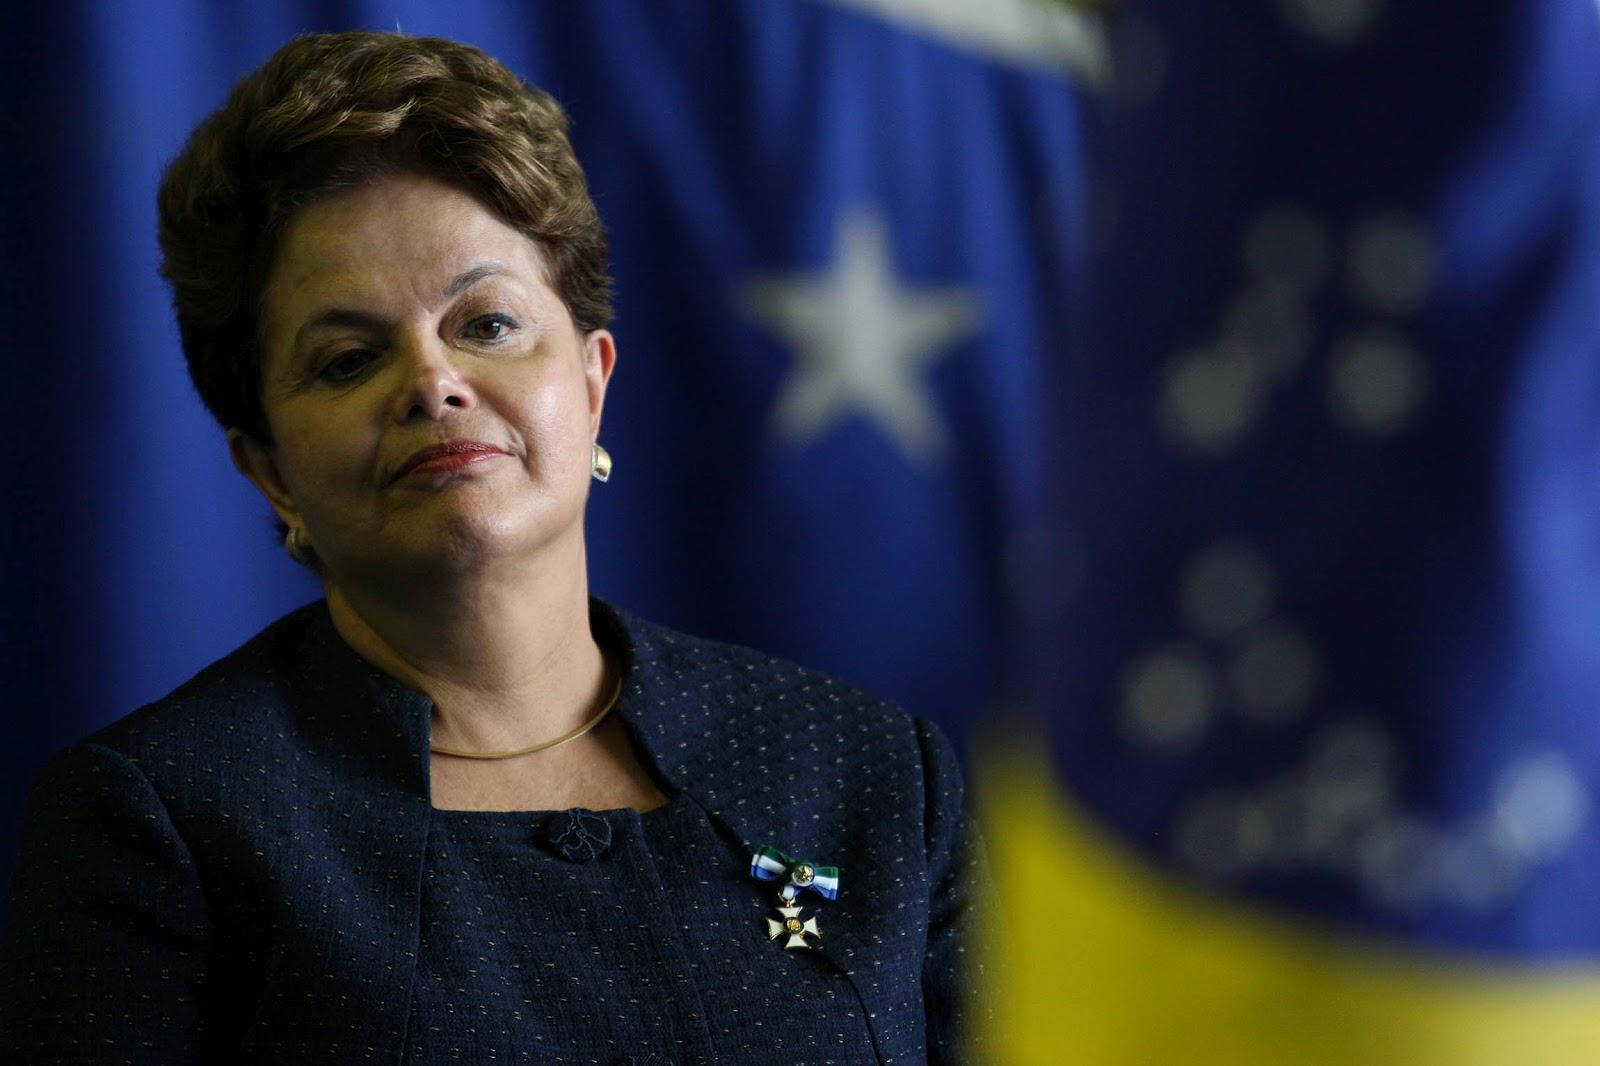 Dilma agora só viaja com seu guarda-roupa